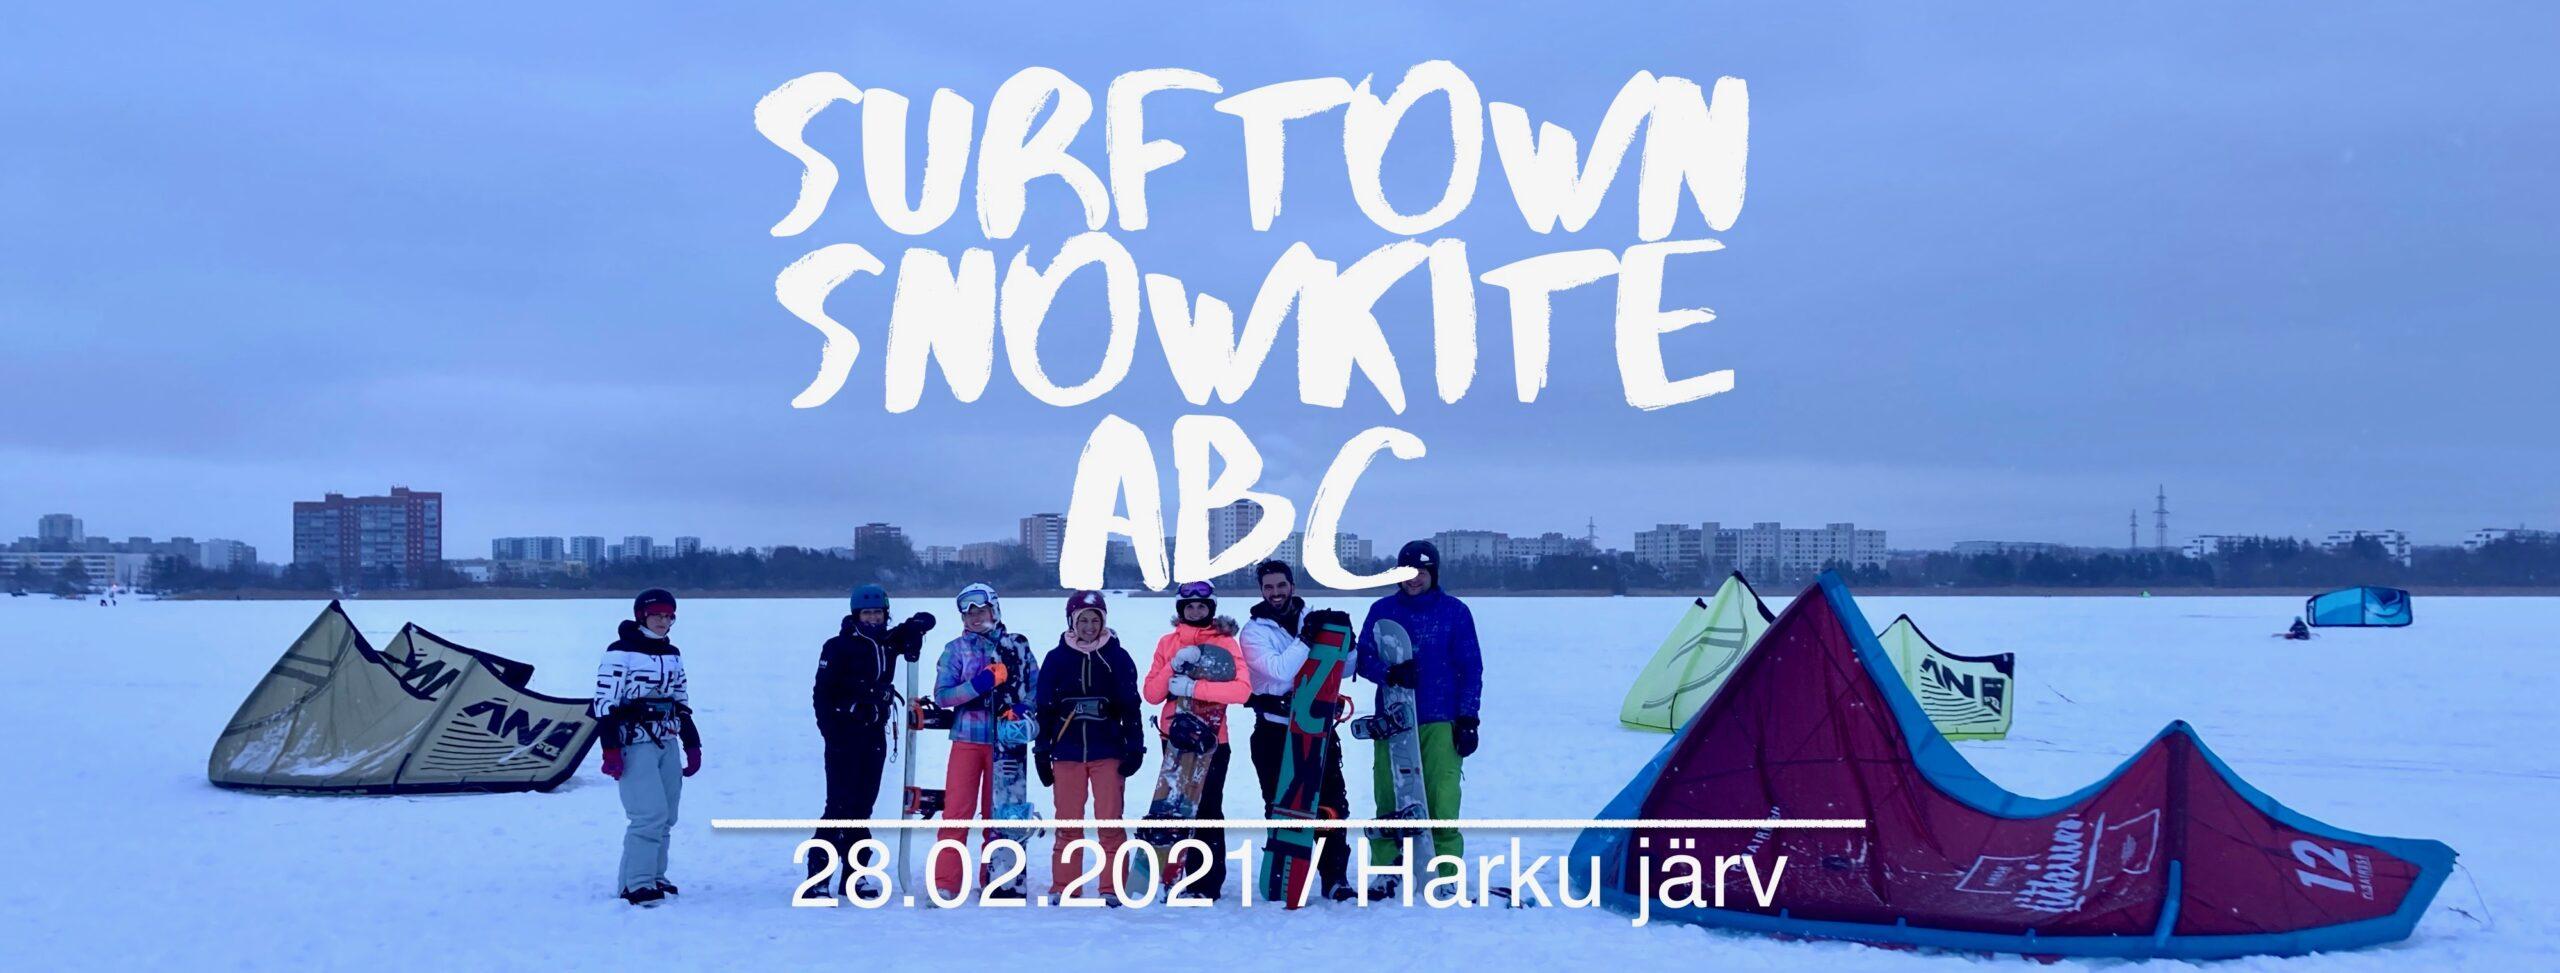 Snowkite ABC